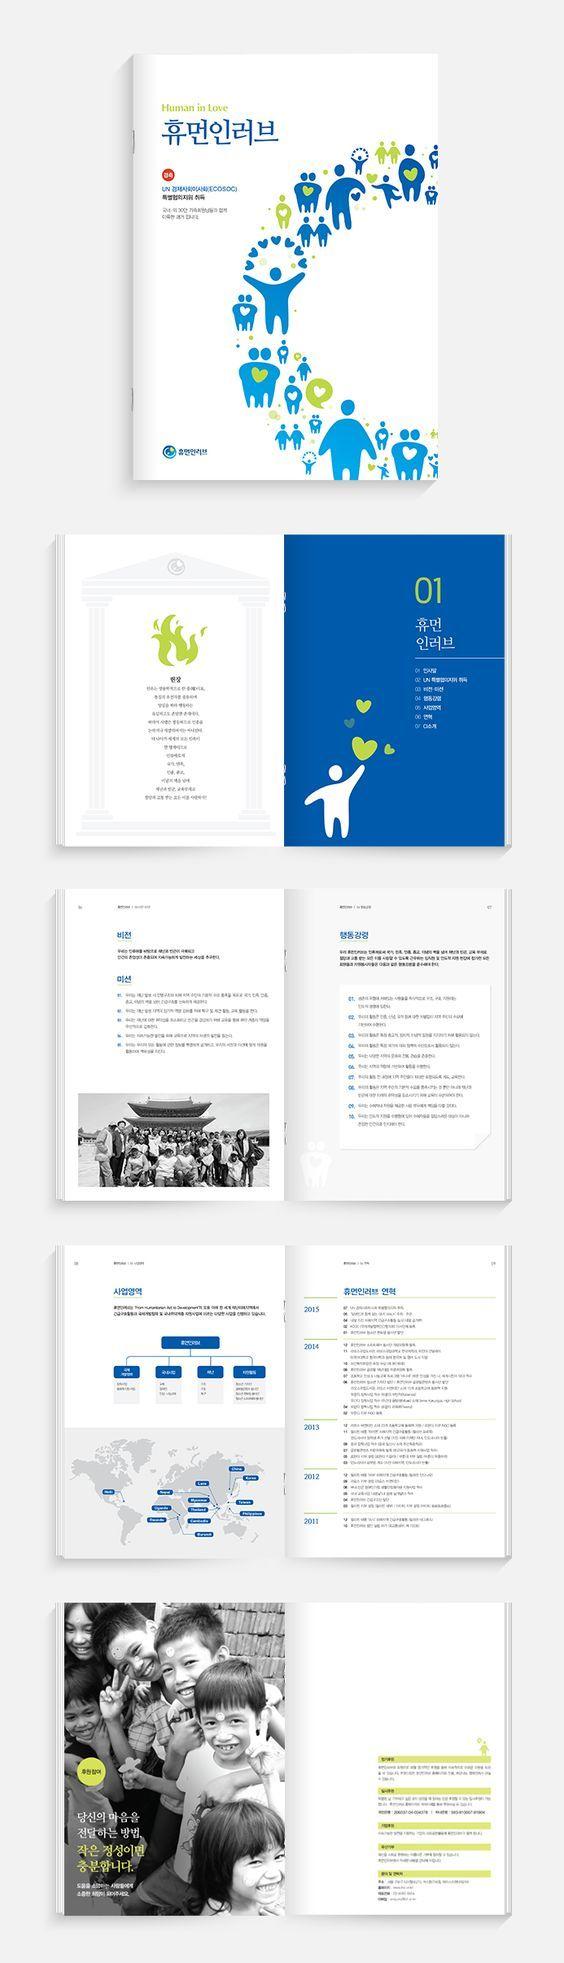 SUNNYISLAND - 휴먼인러브 기업 보고서: